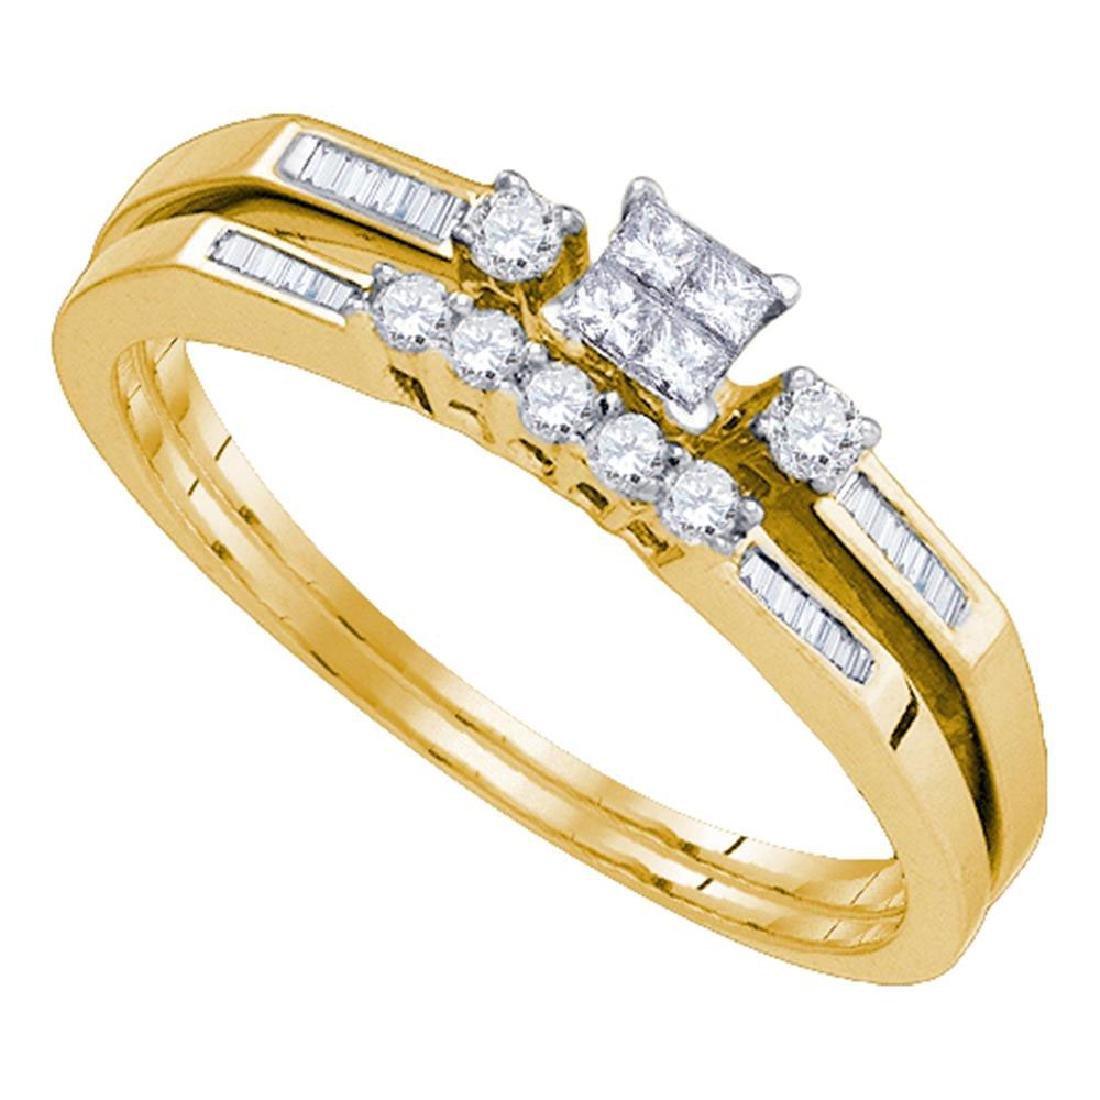 Princess Diamond Slender Wedding Bridal Engagement Ring